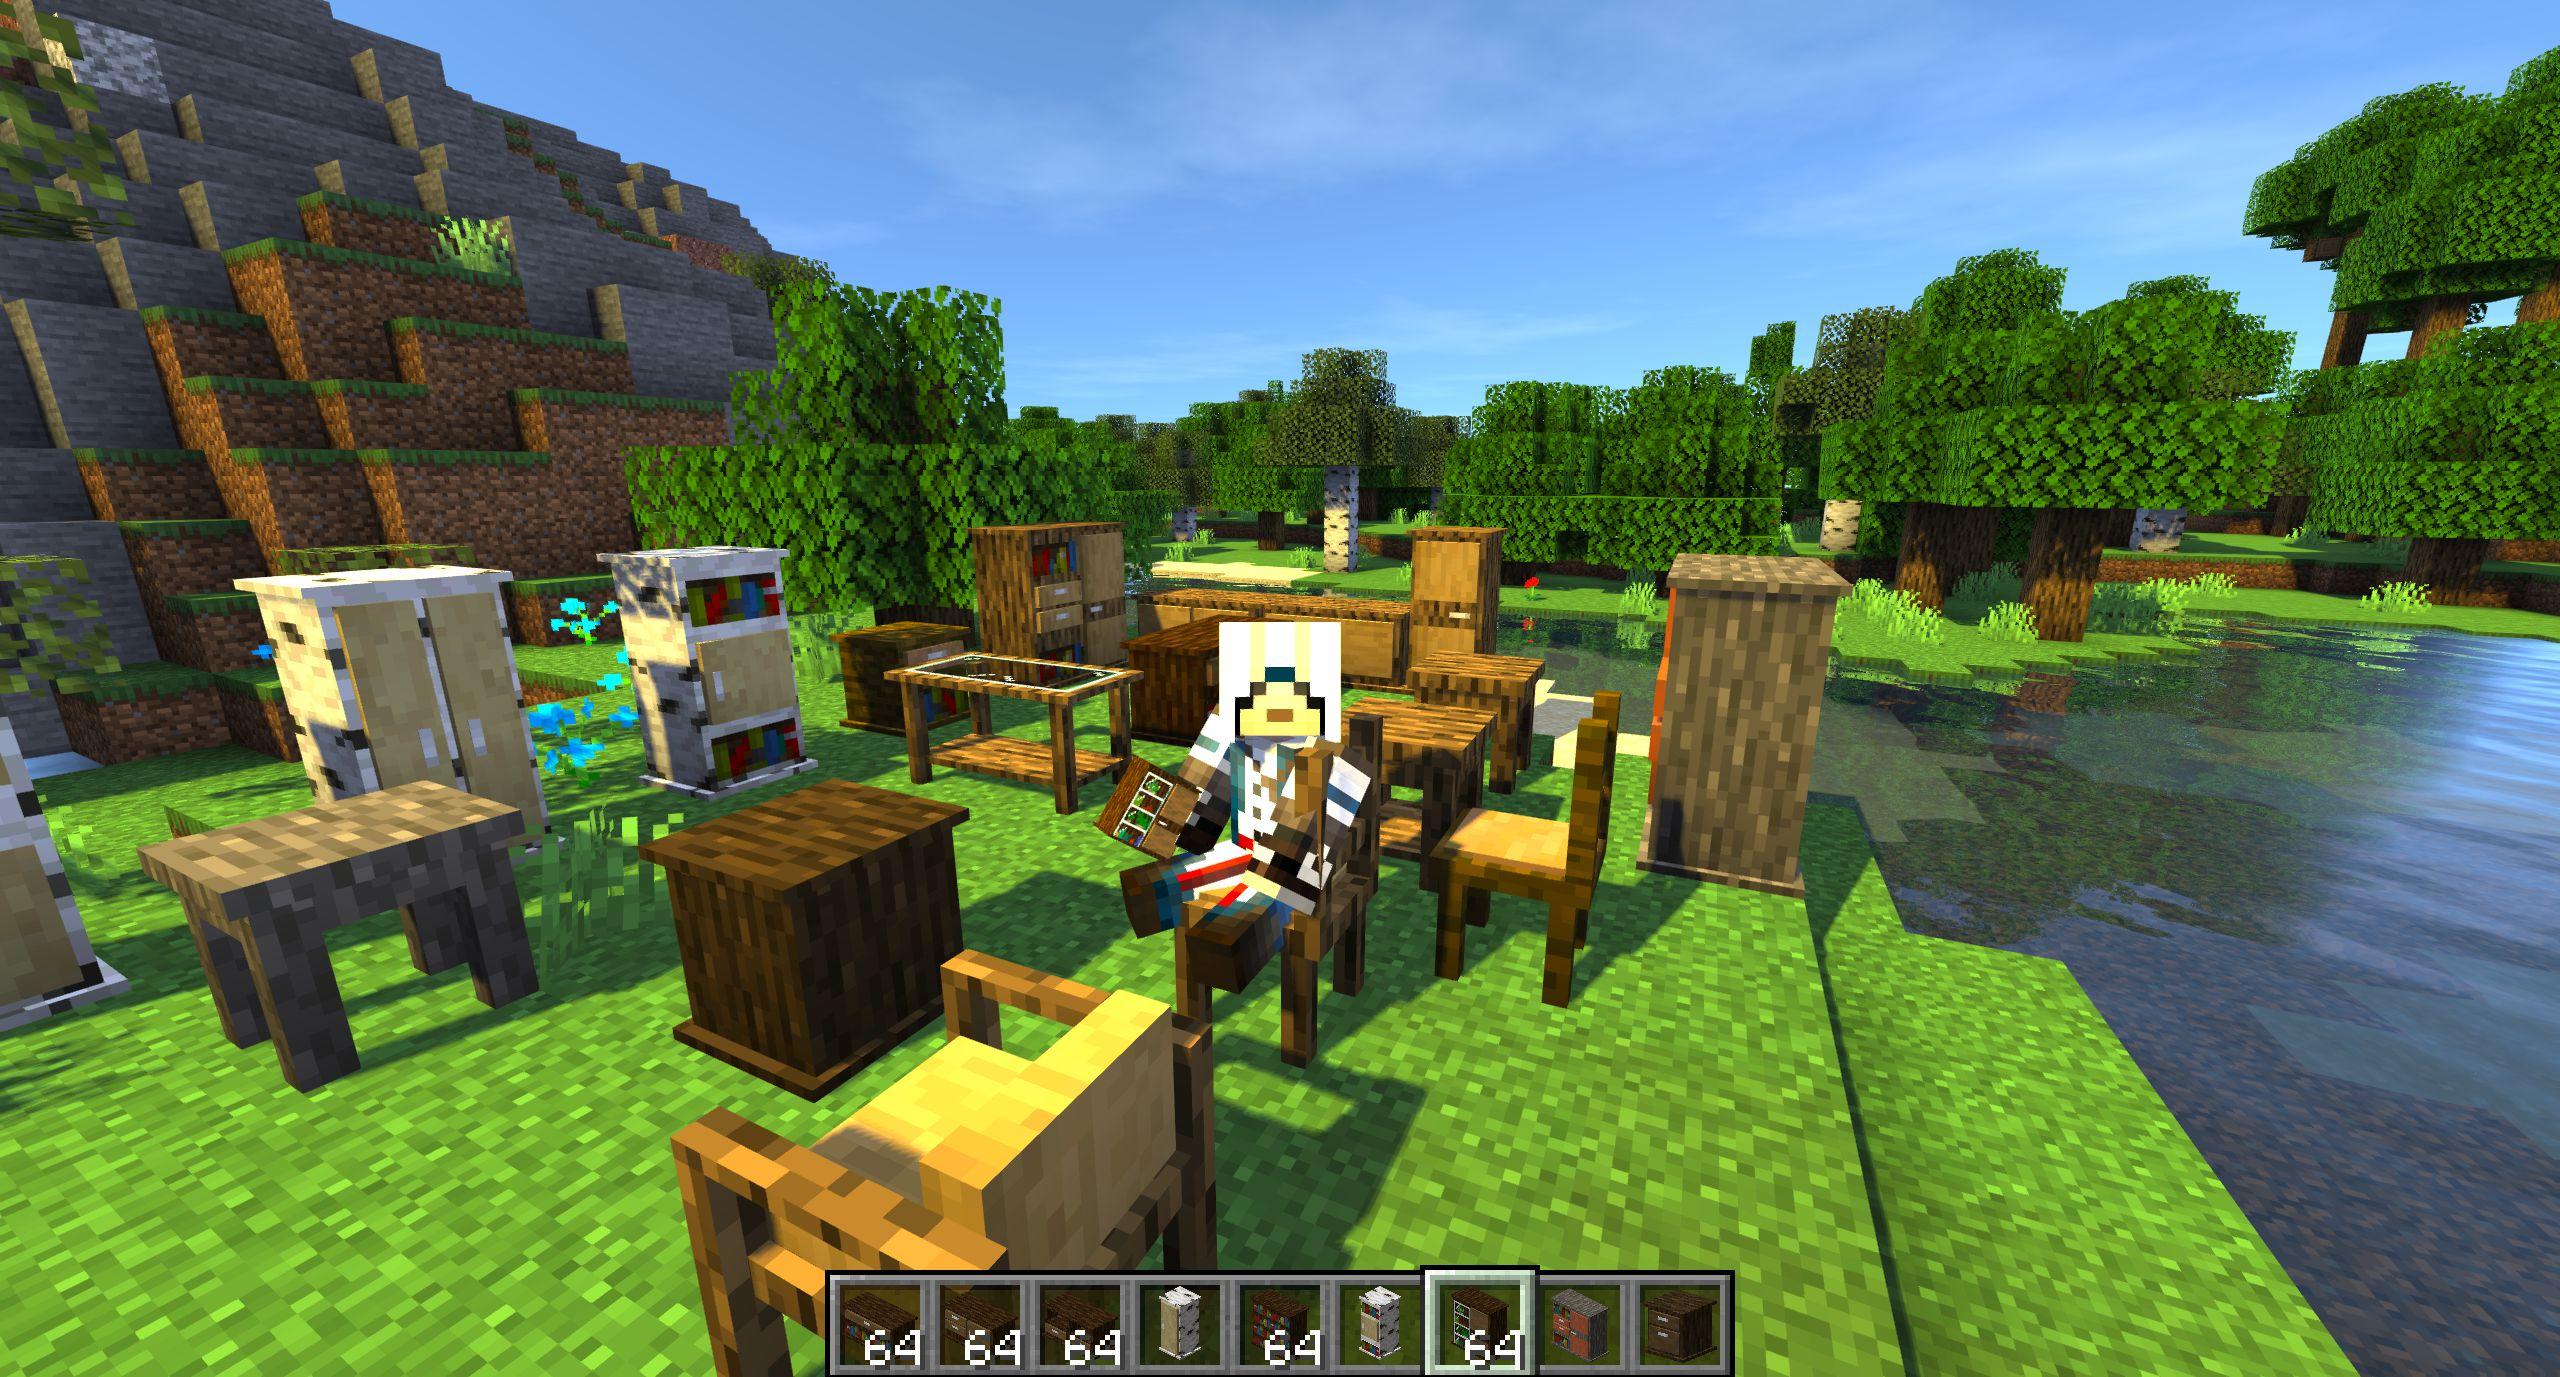 Мод на мебель «Macaw's Furniture» - скриншот 1